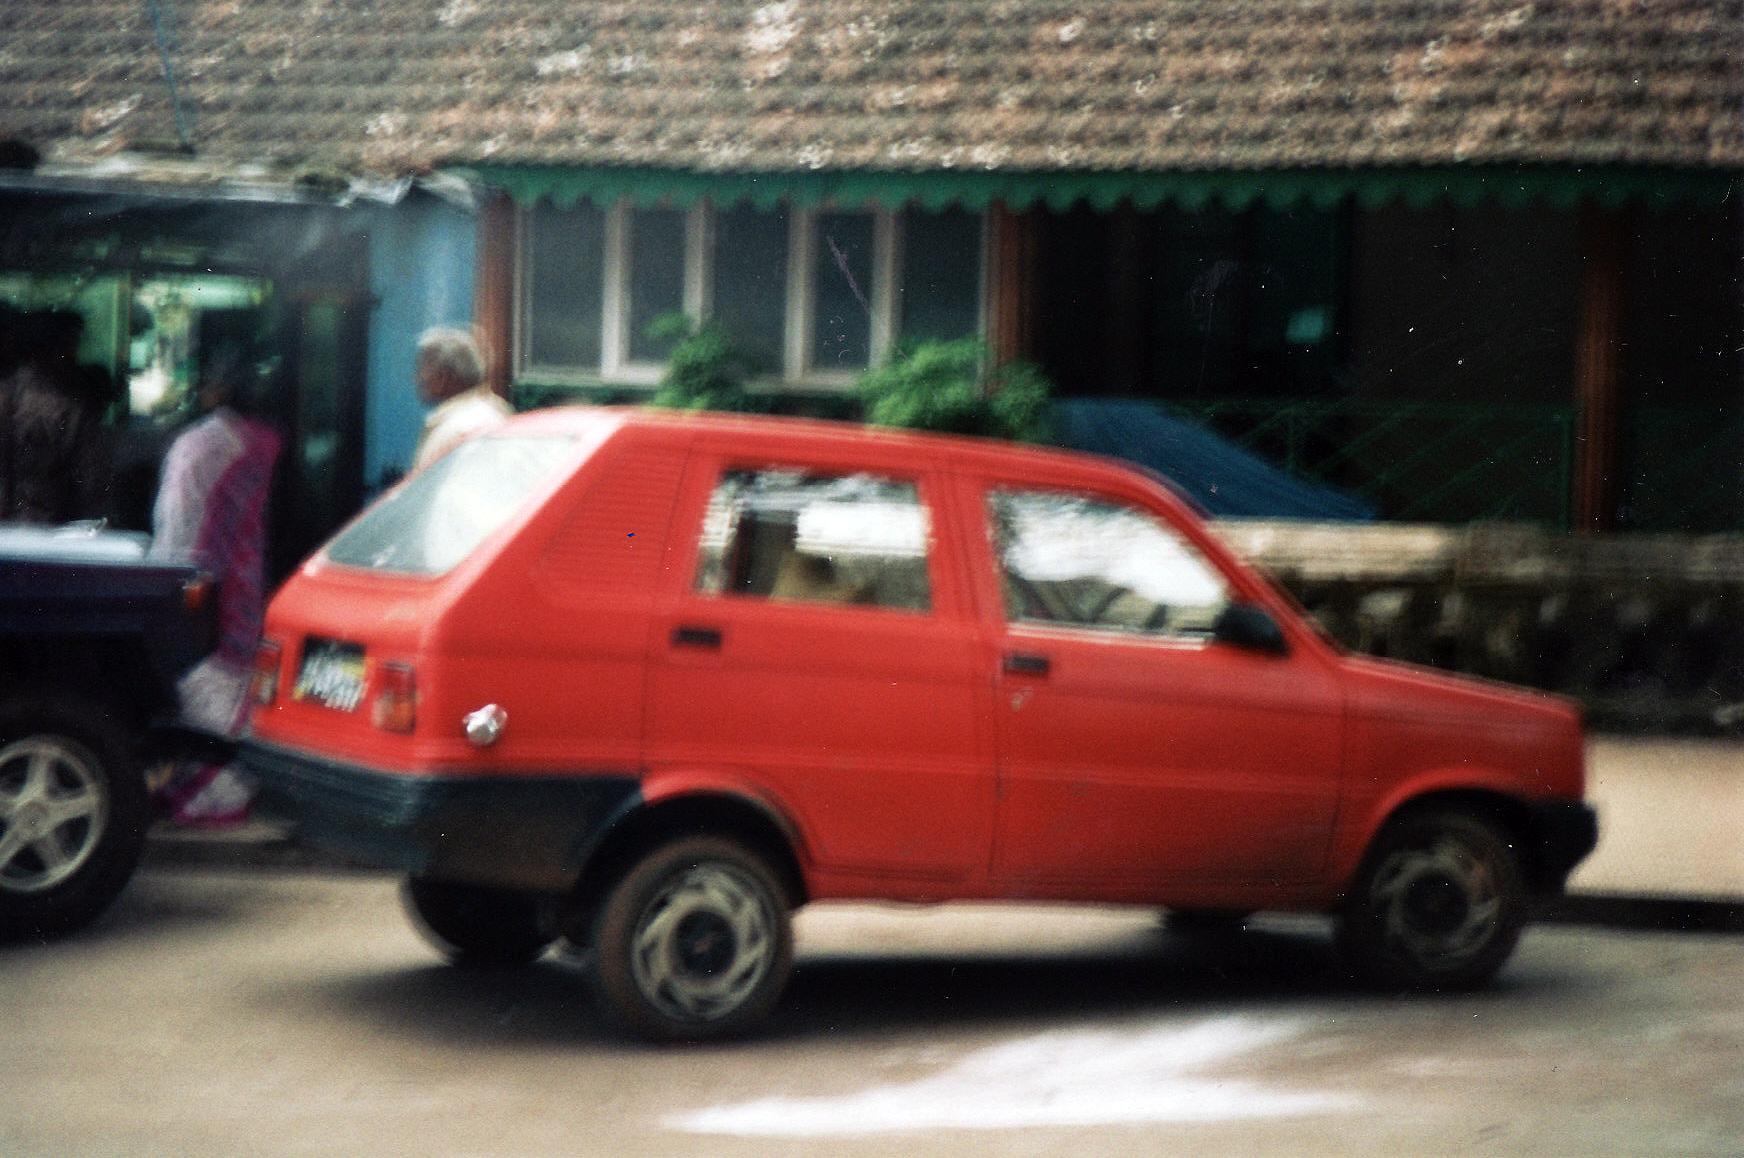 Reliant Robin kitten Rialto door hinge No25846 upper LH only Classic car part LH